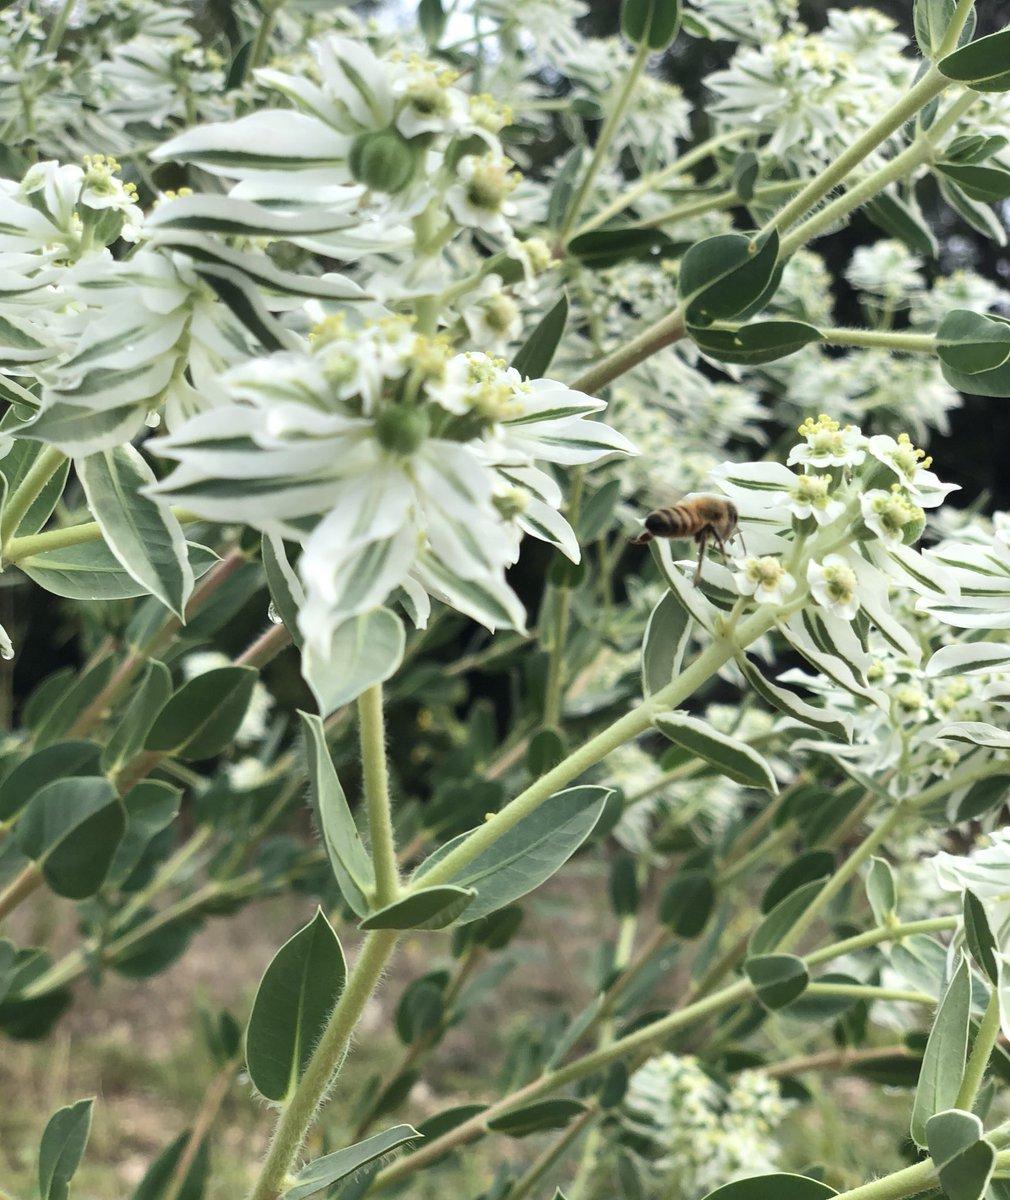 September flowers, busy bees...always in bloom, San Antonio https://t.co/lH1V8fHGw4